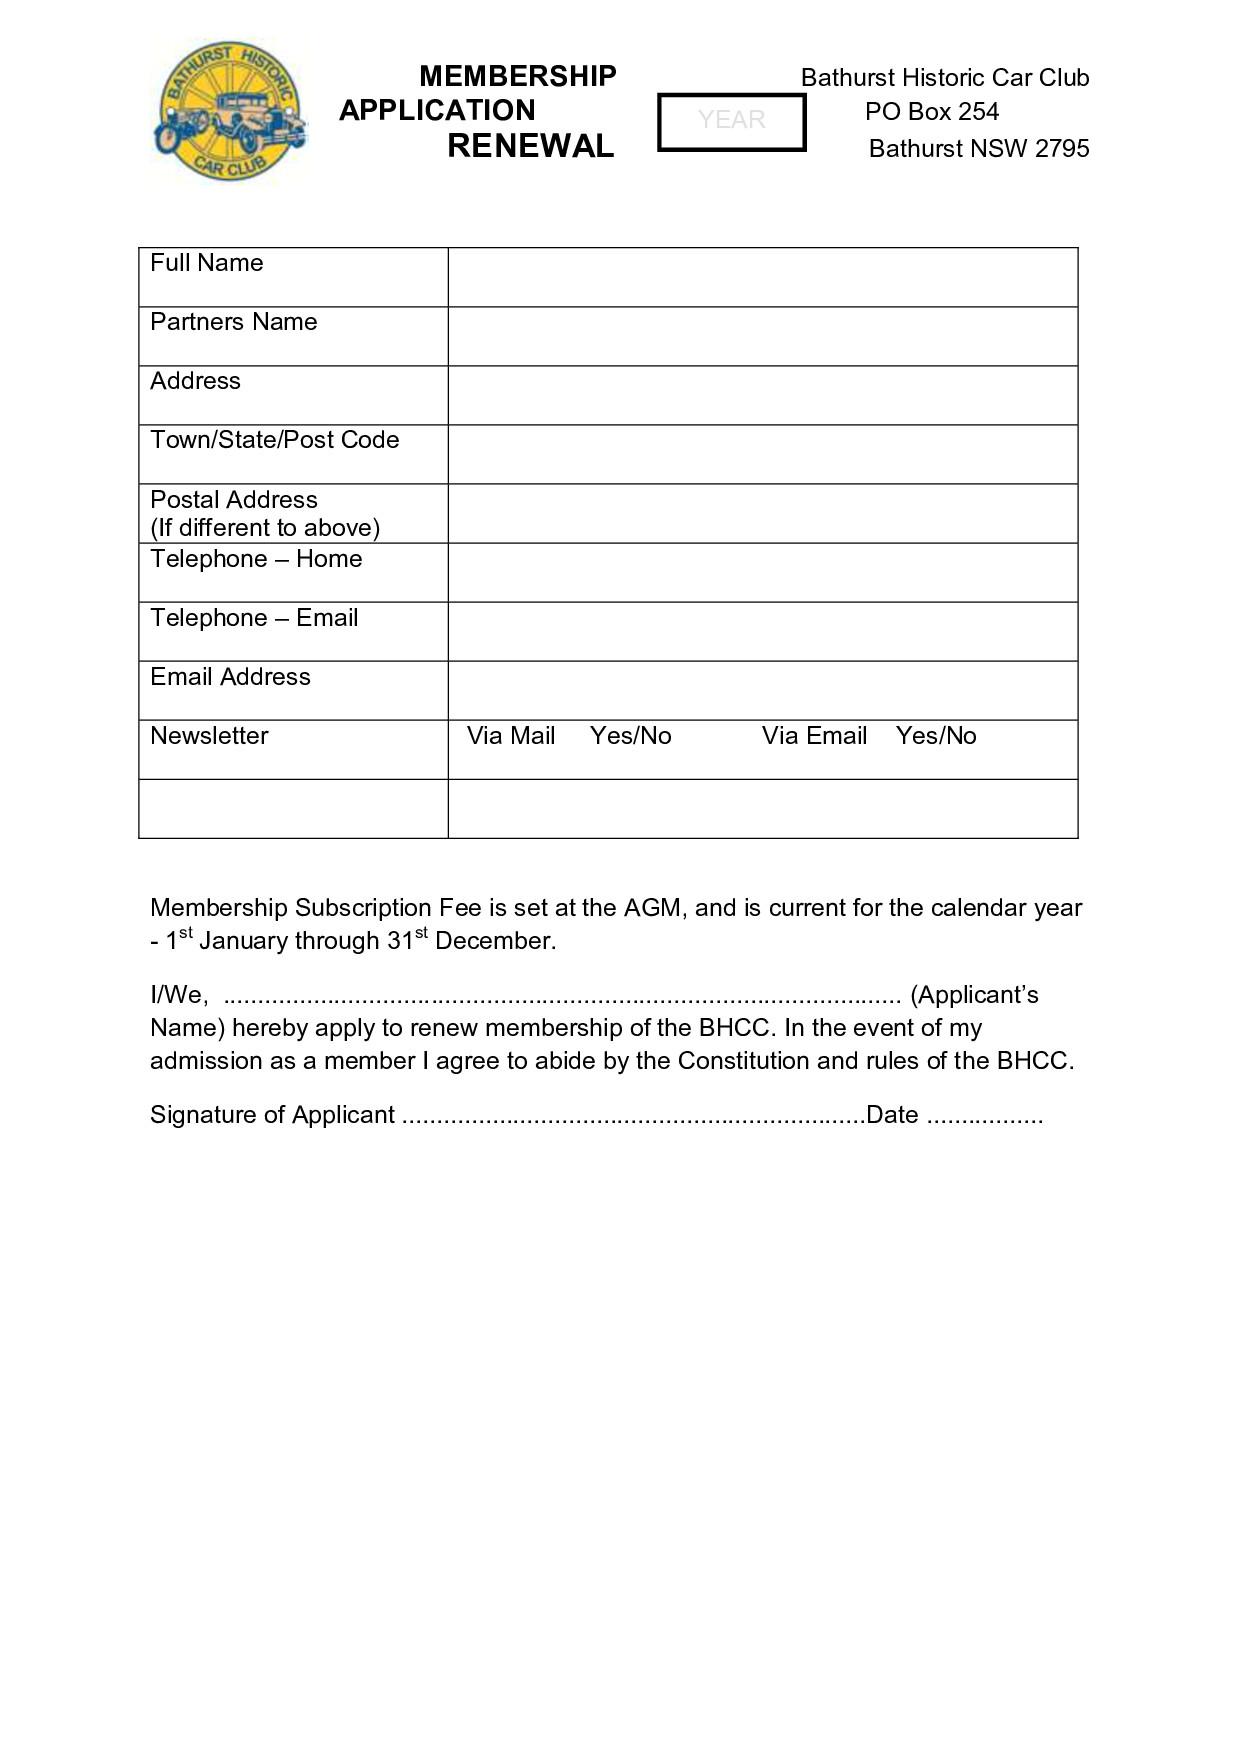 BHCC Member Application Form - Renewal - 190420_p001.jpg